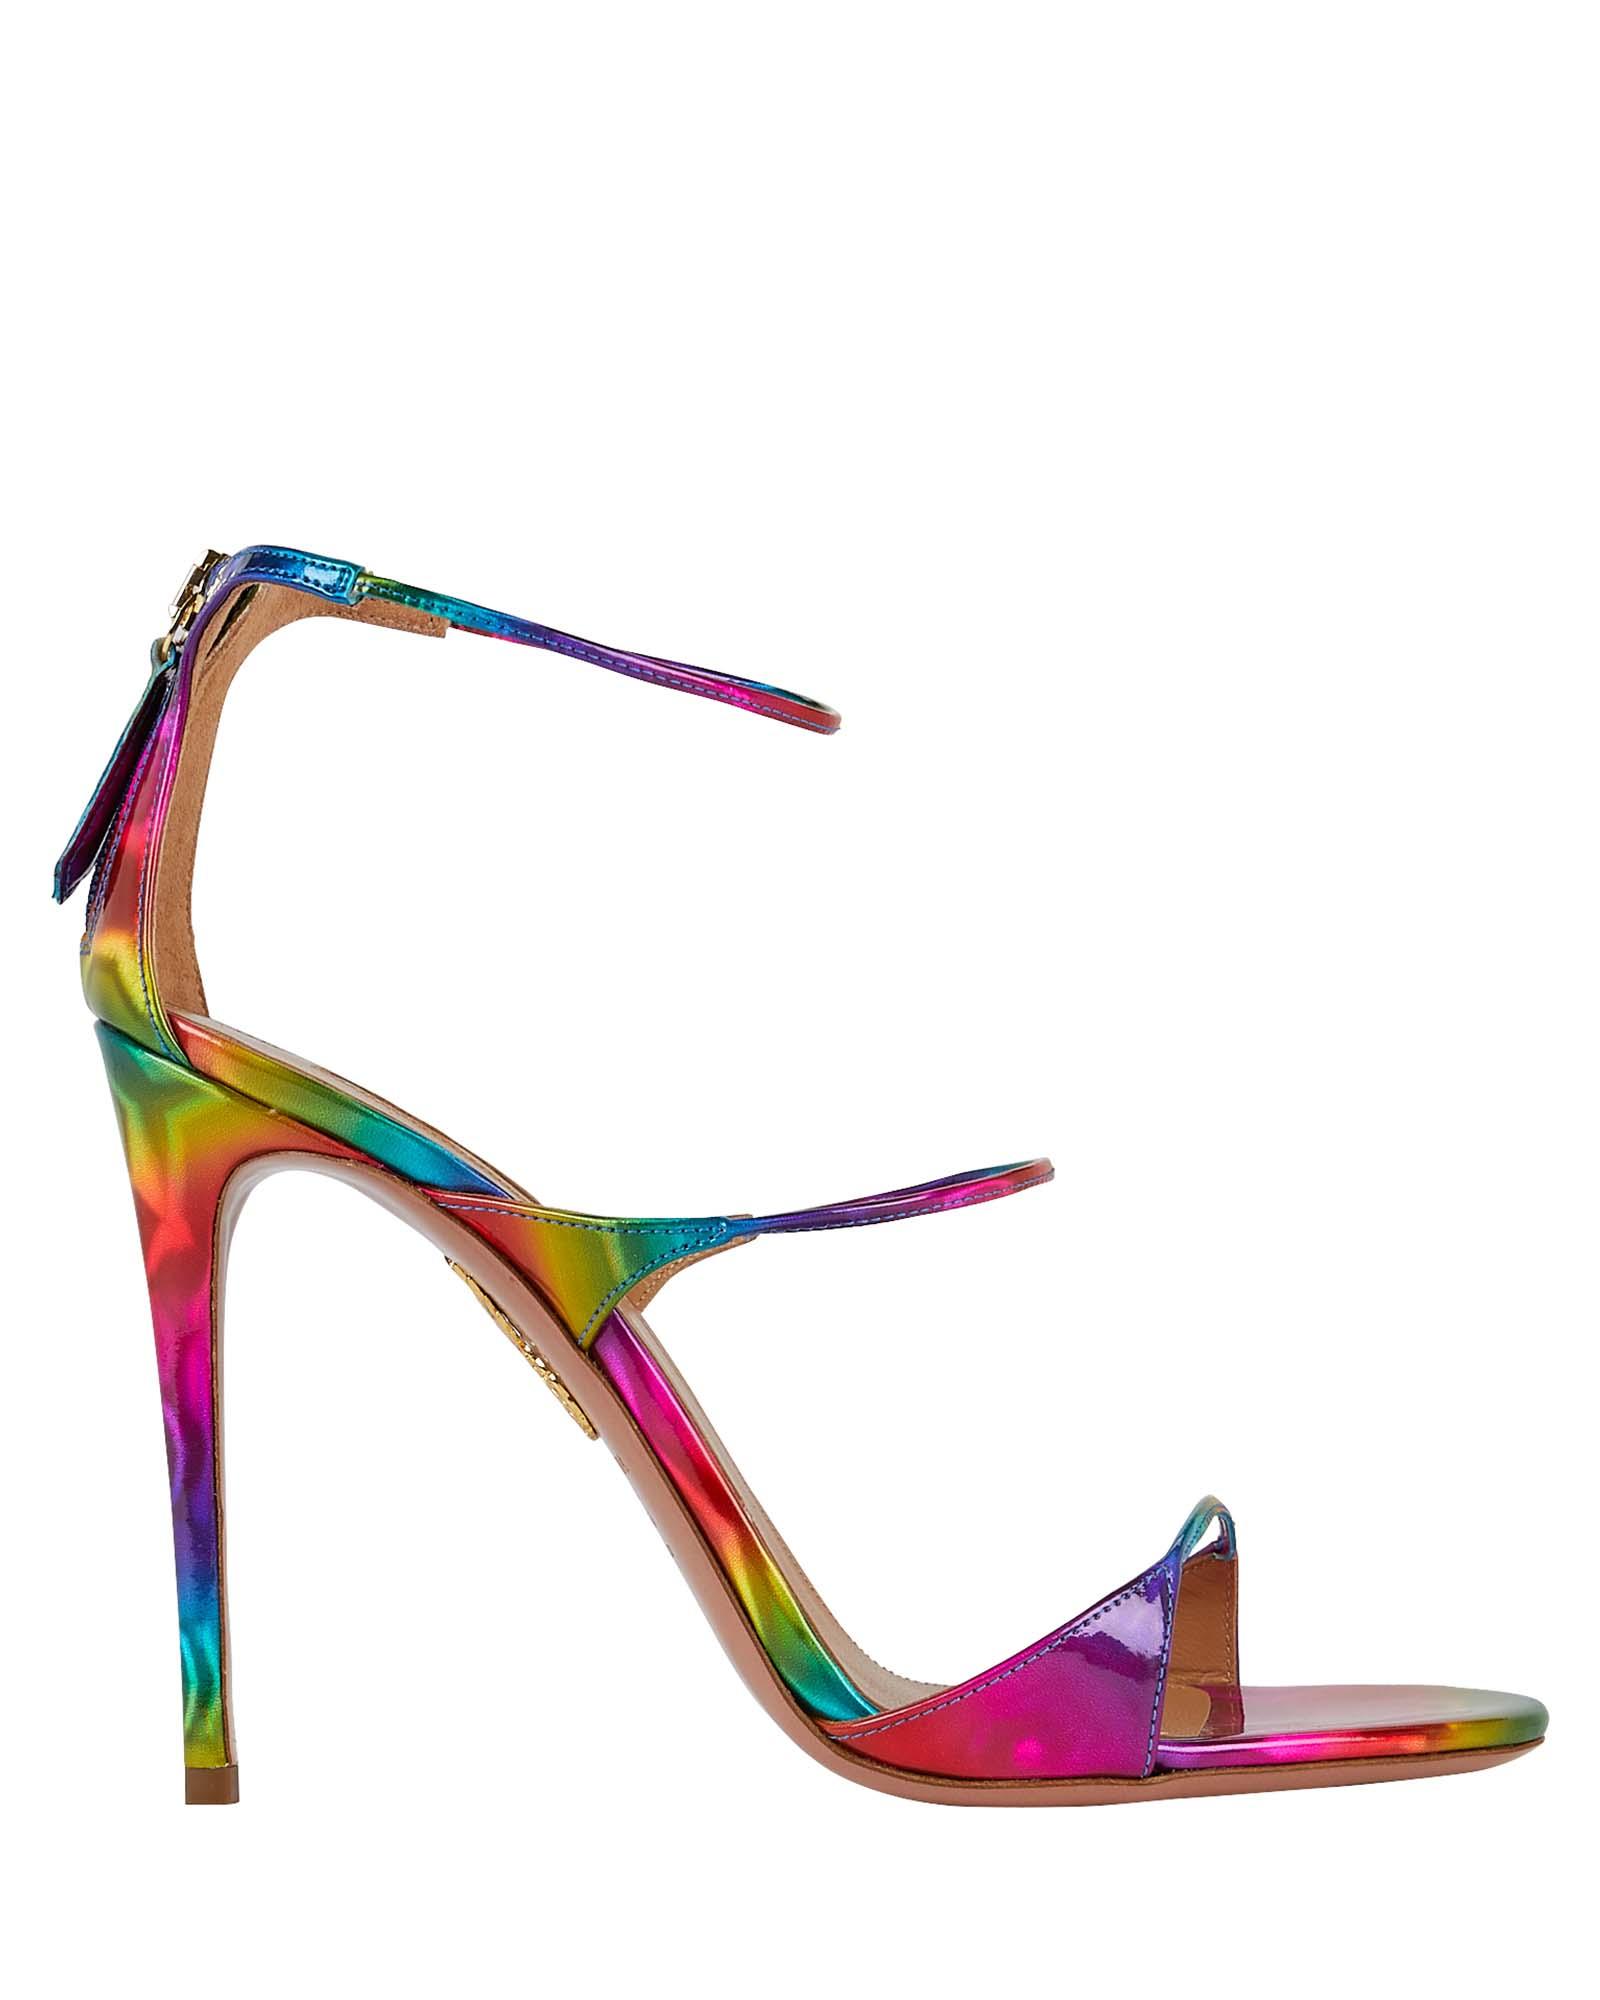 Aquazzura Sandals Minute 105 Rainbow Leather Sandals